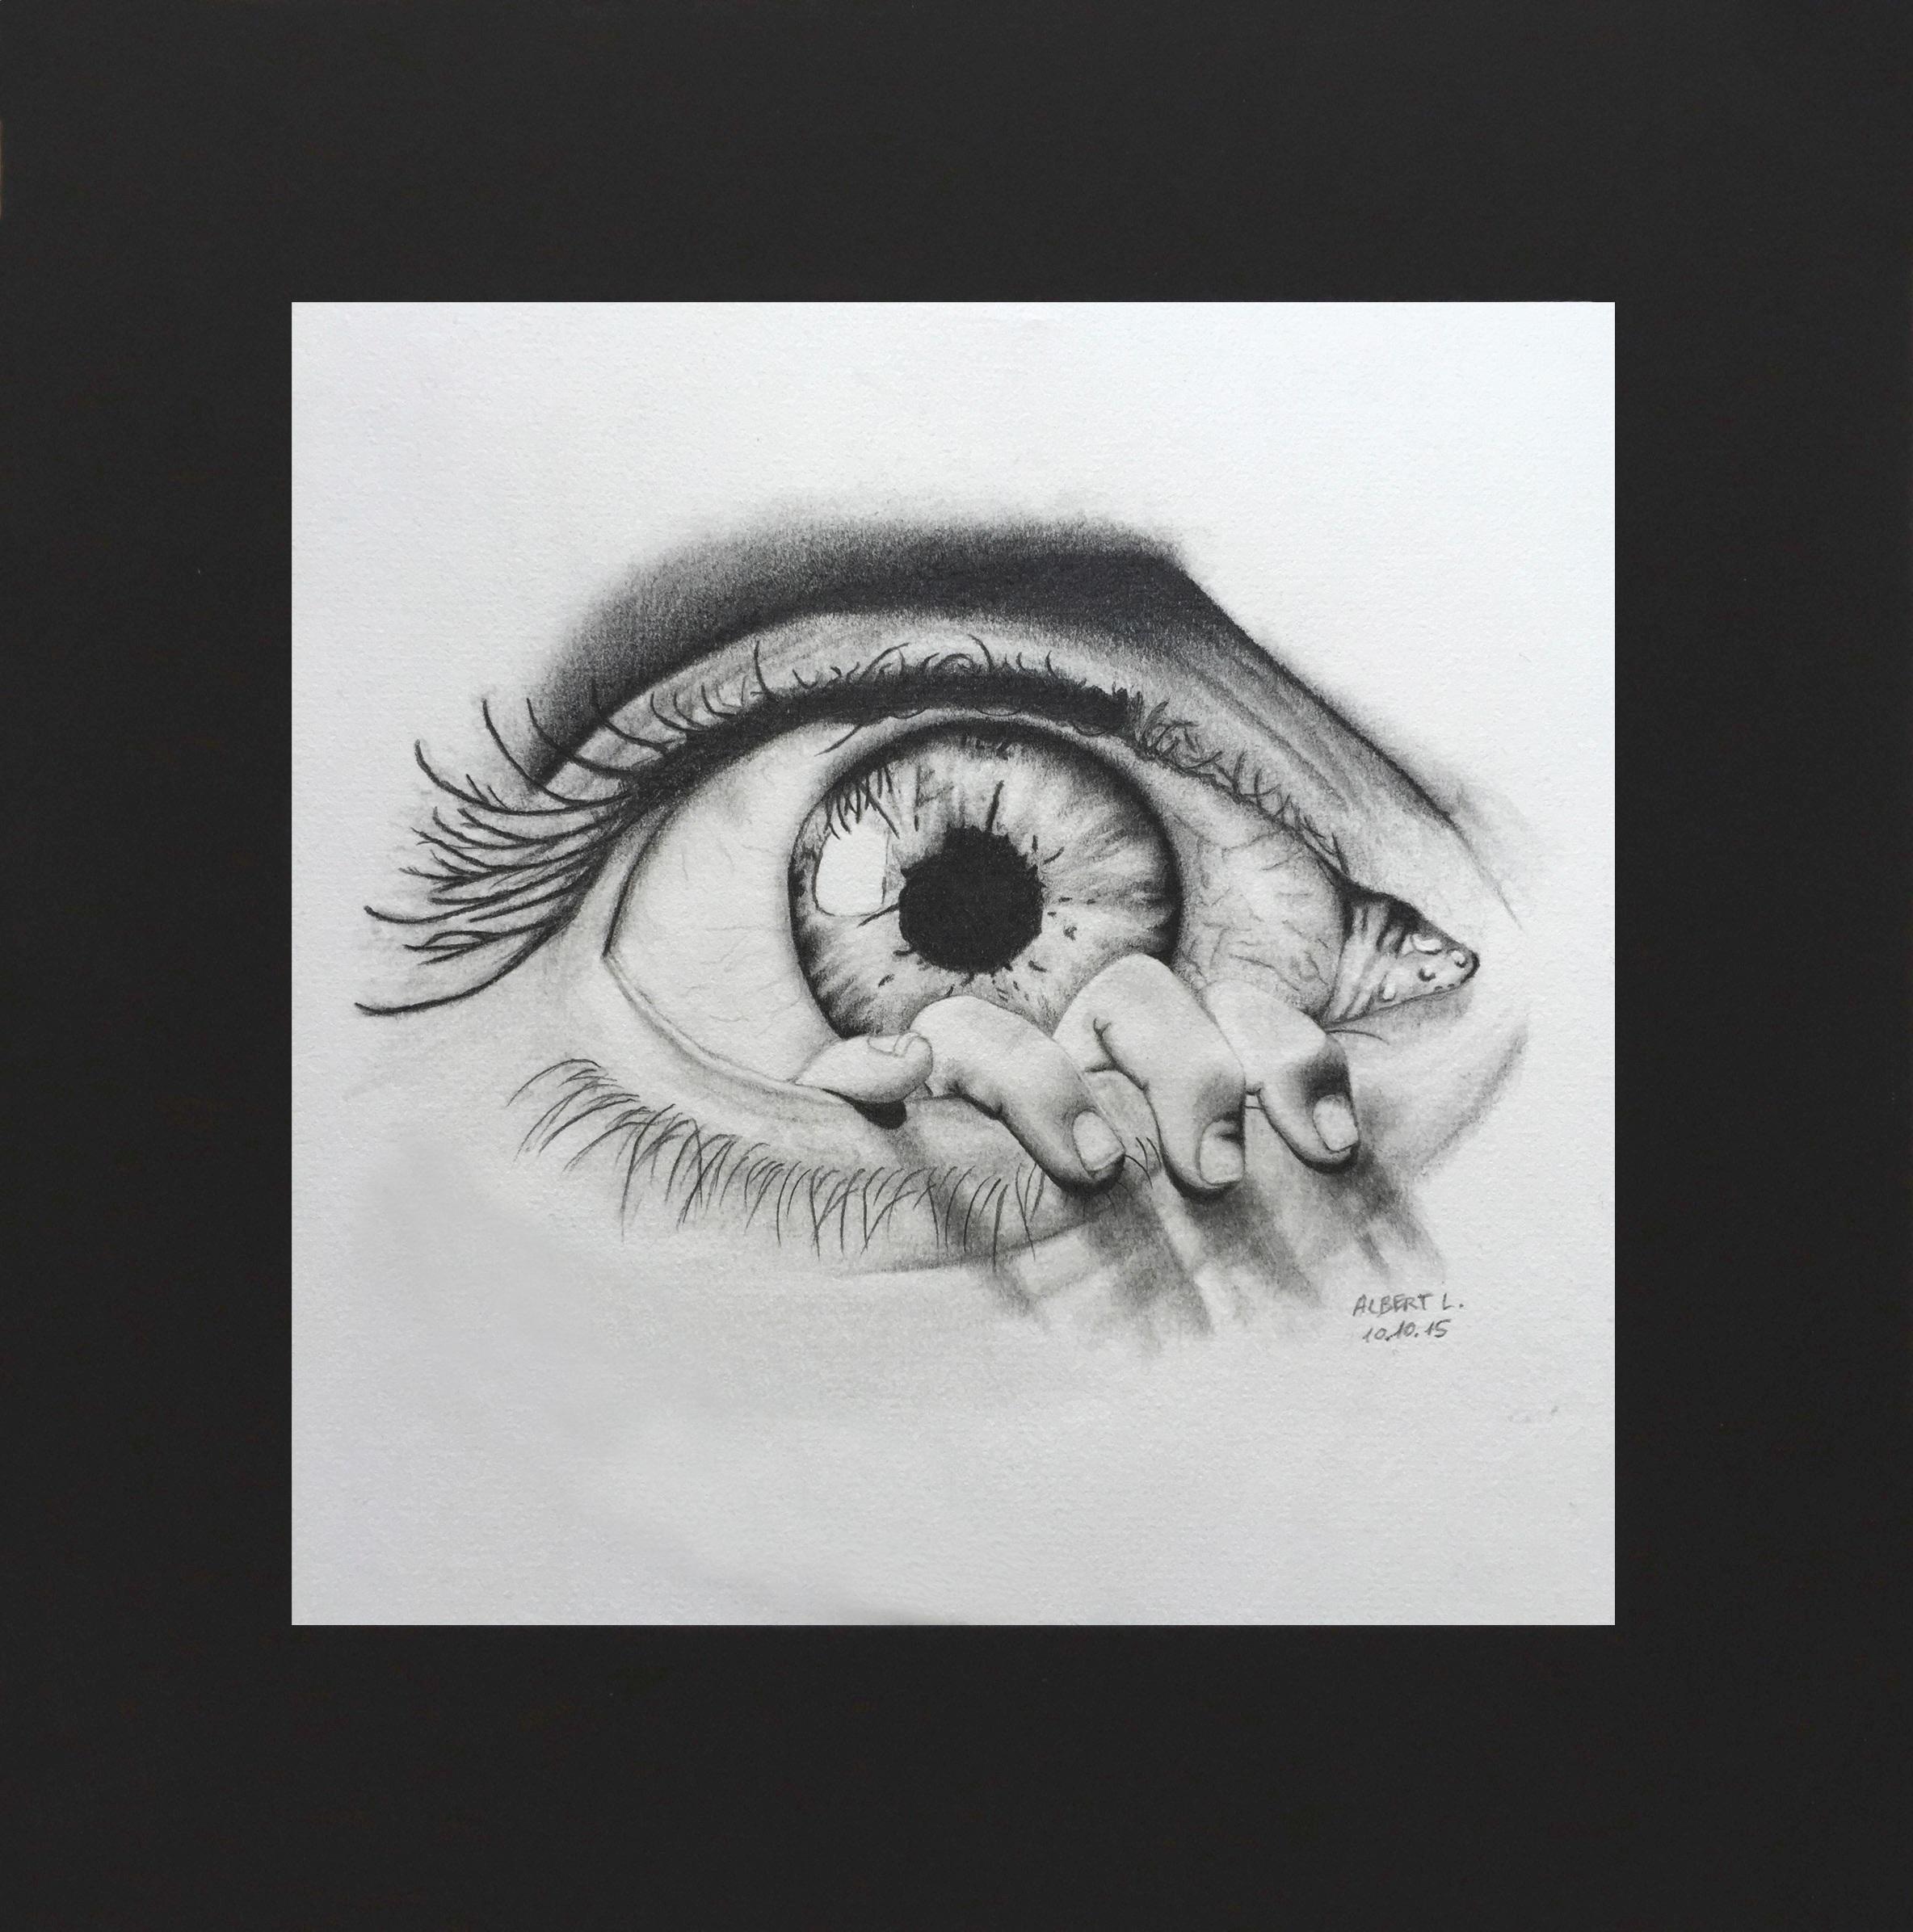 The eye - 10/10/2015